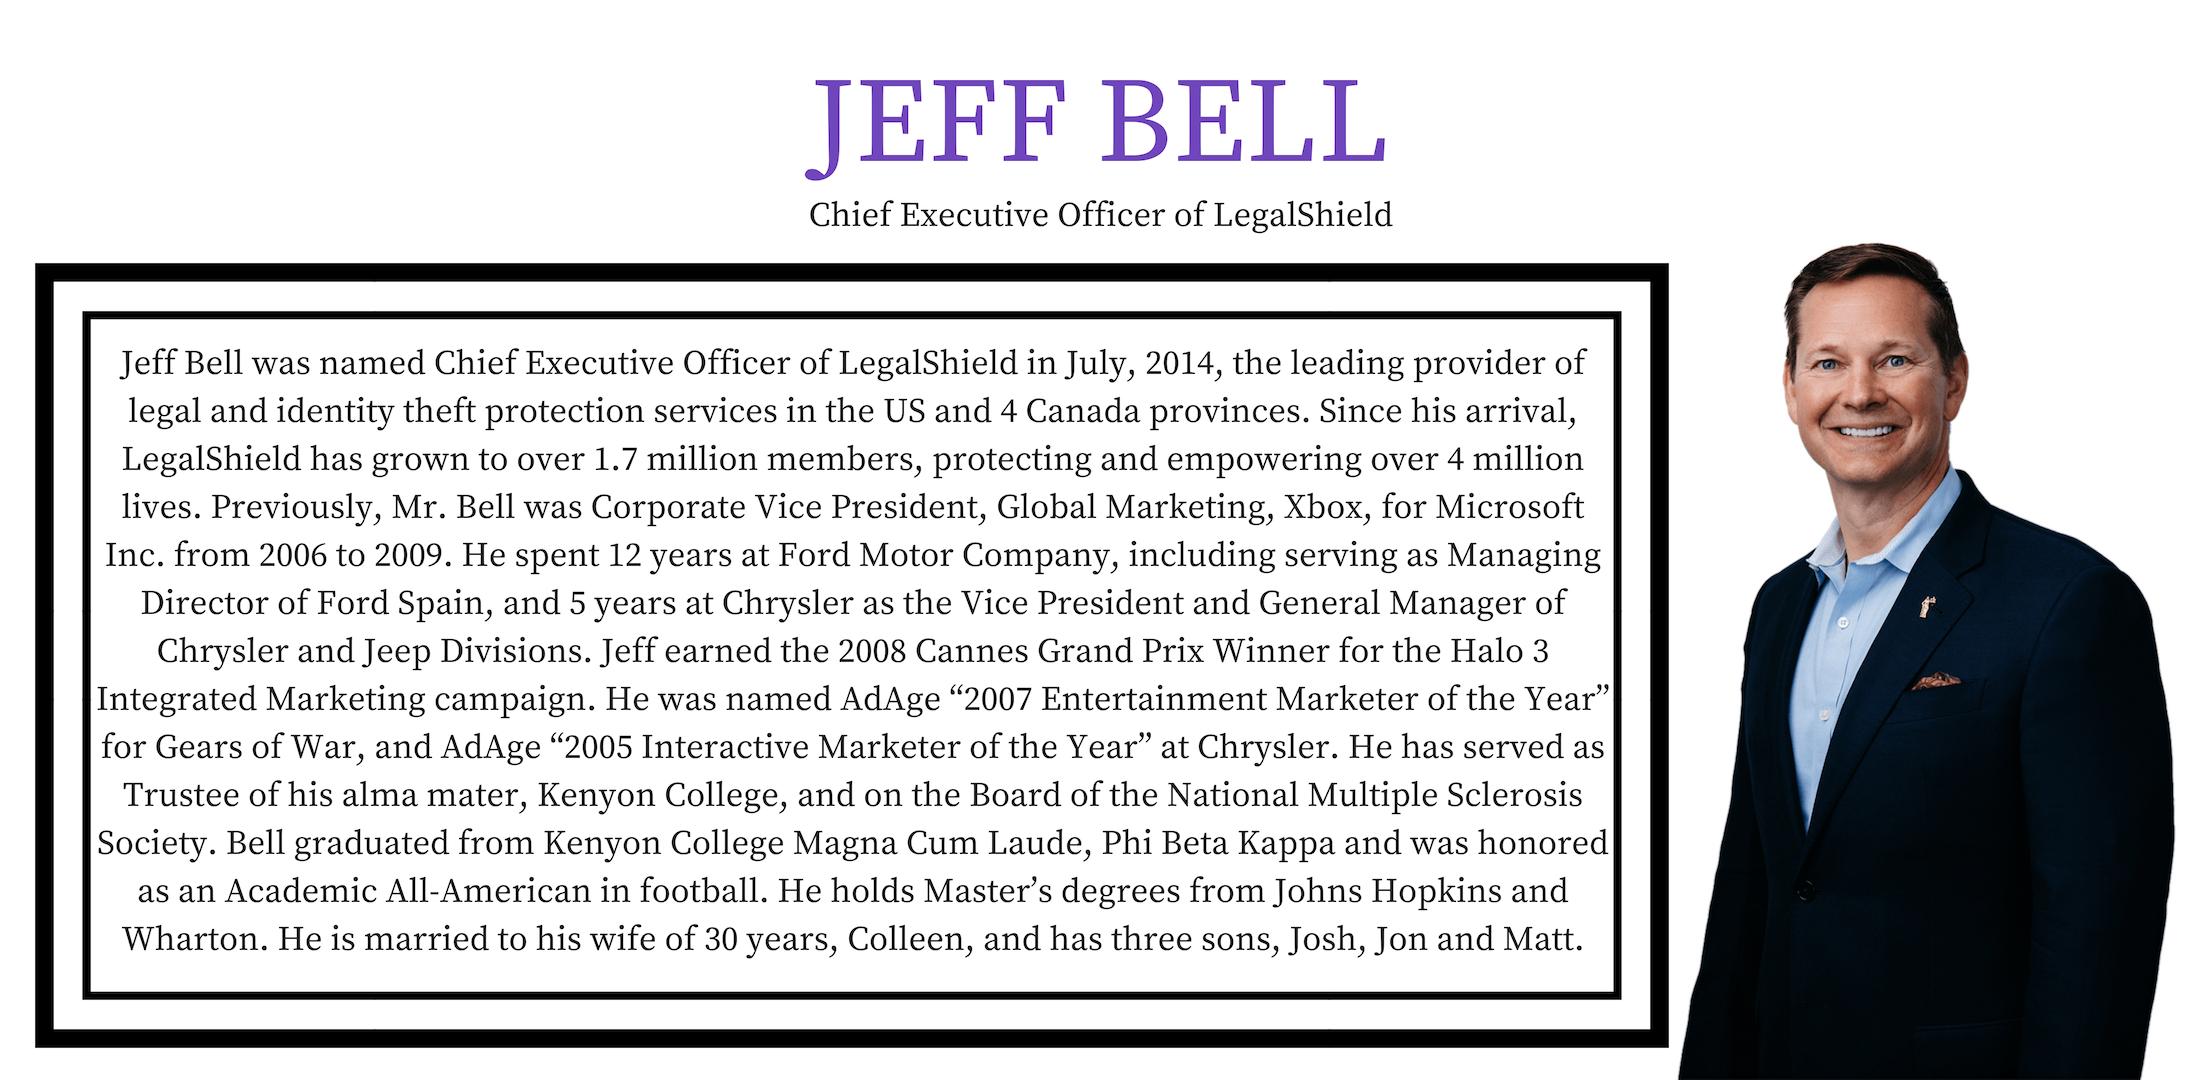 JeffBell